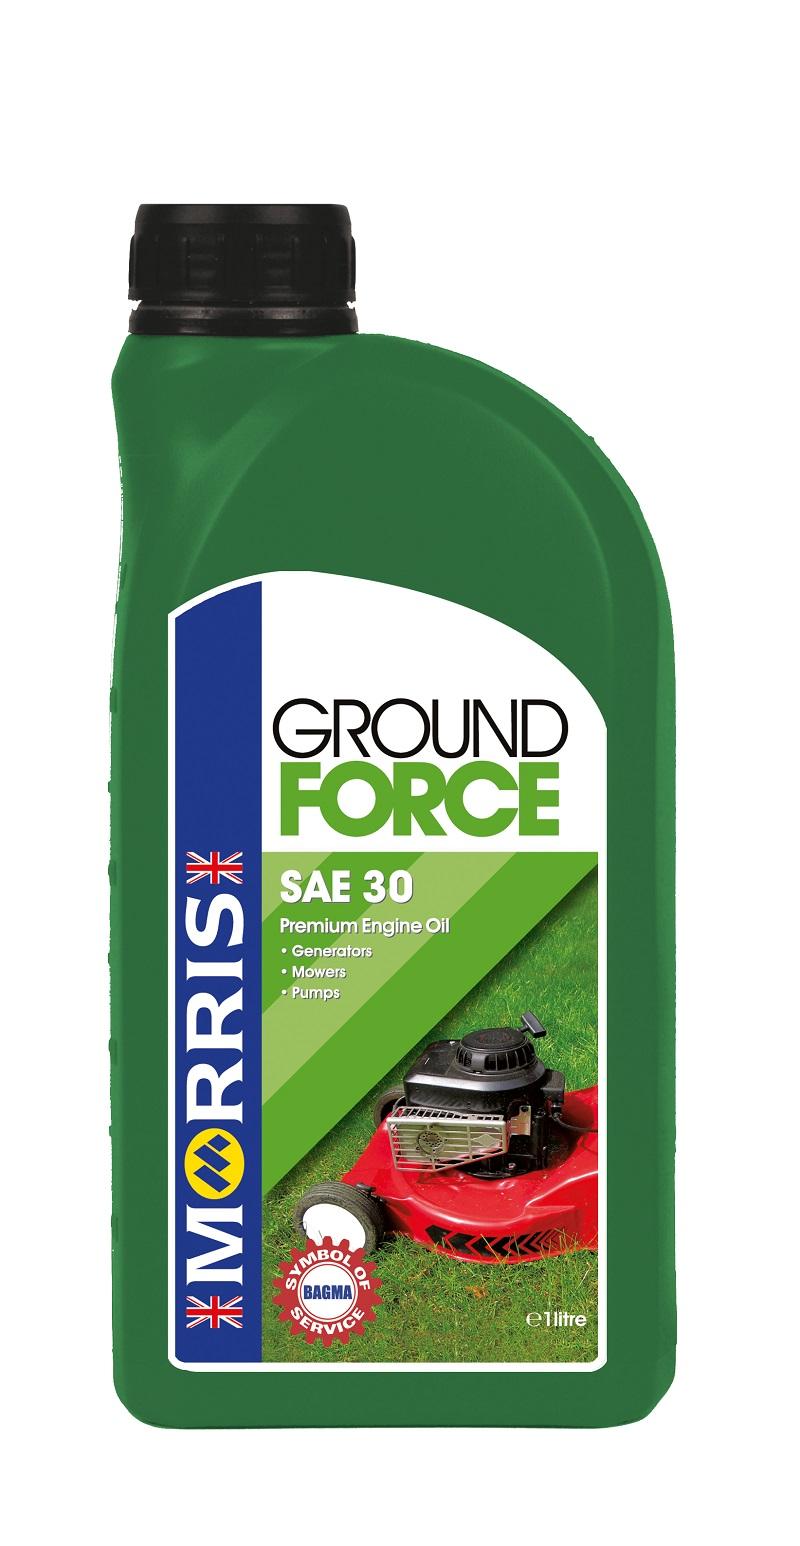 Ground Force SAE 30 Engine Oil